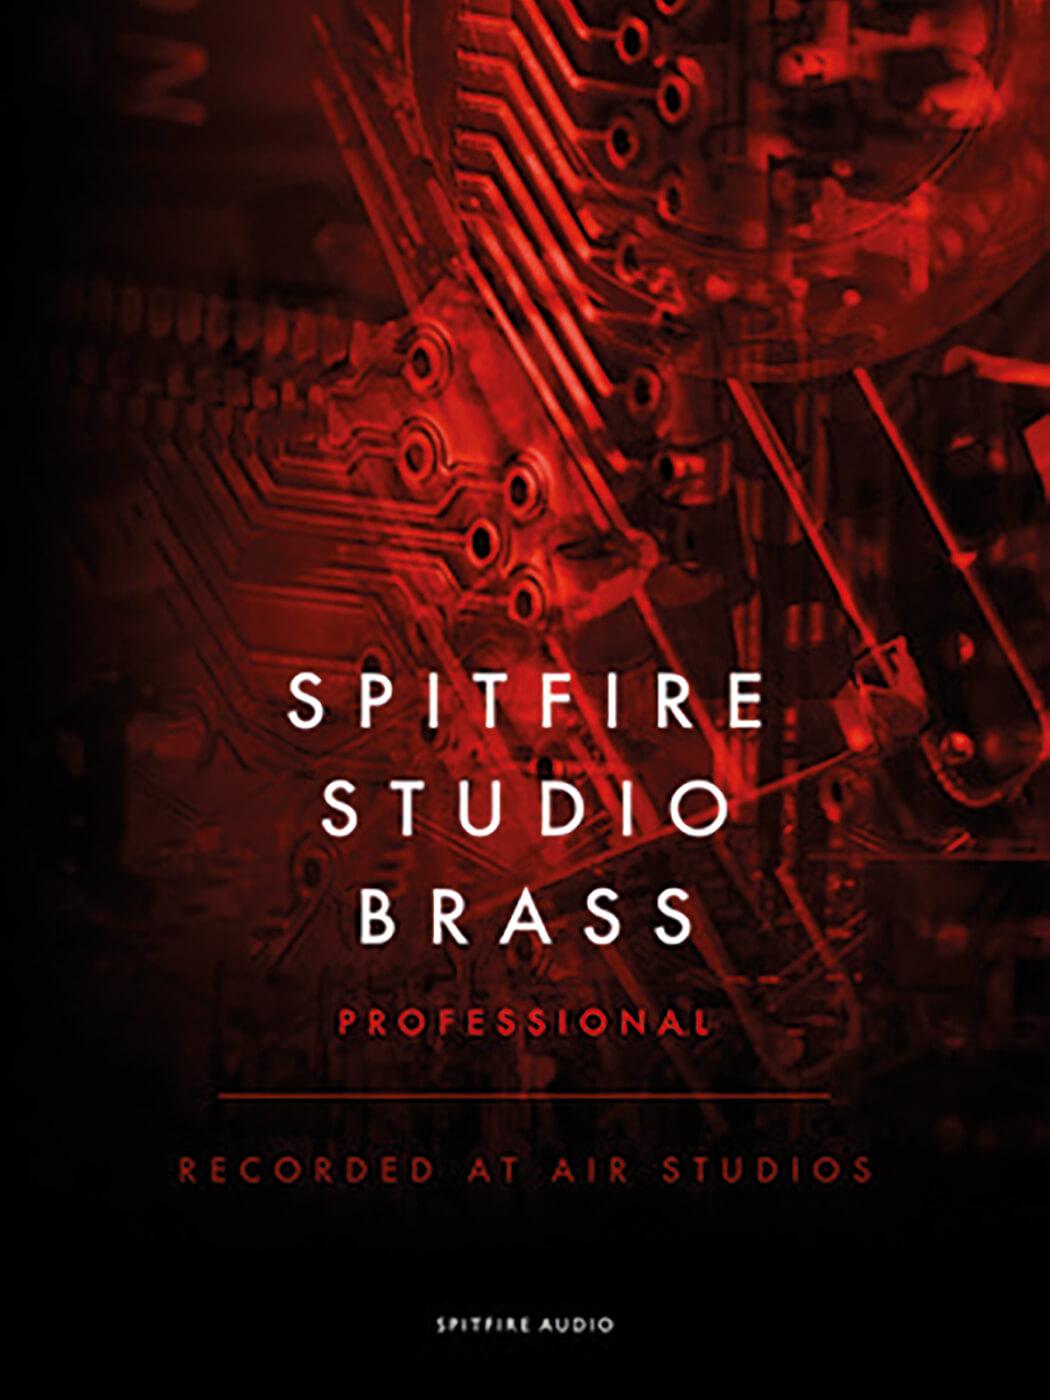 spitfire studio brass professional